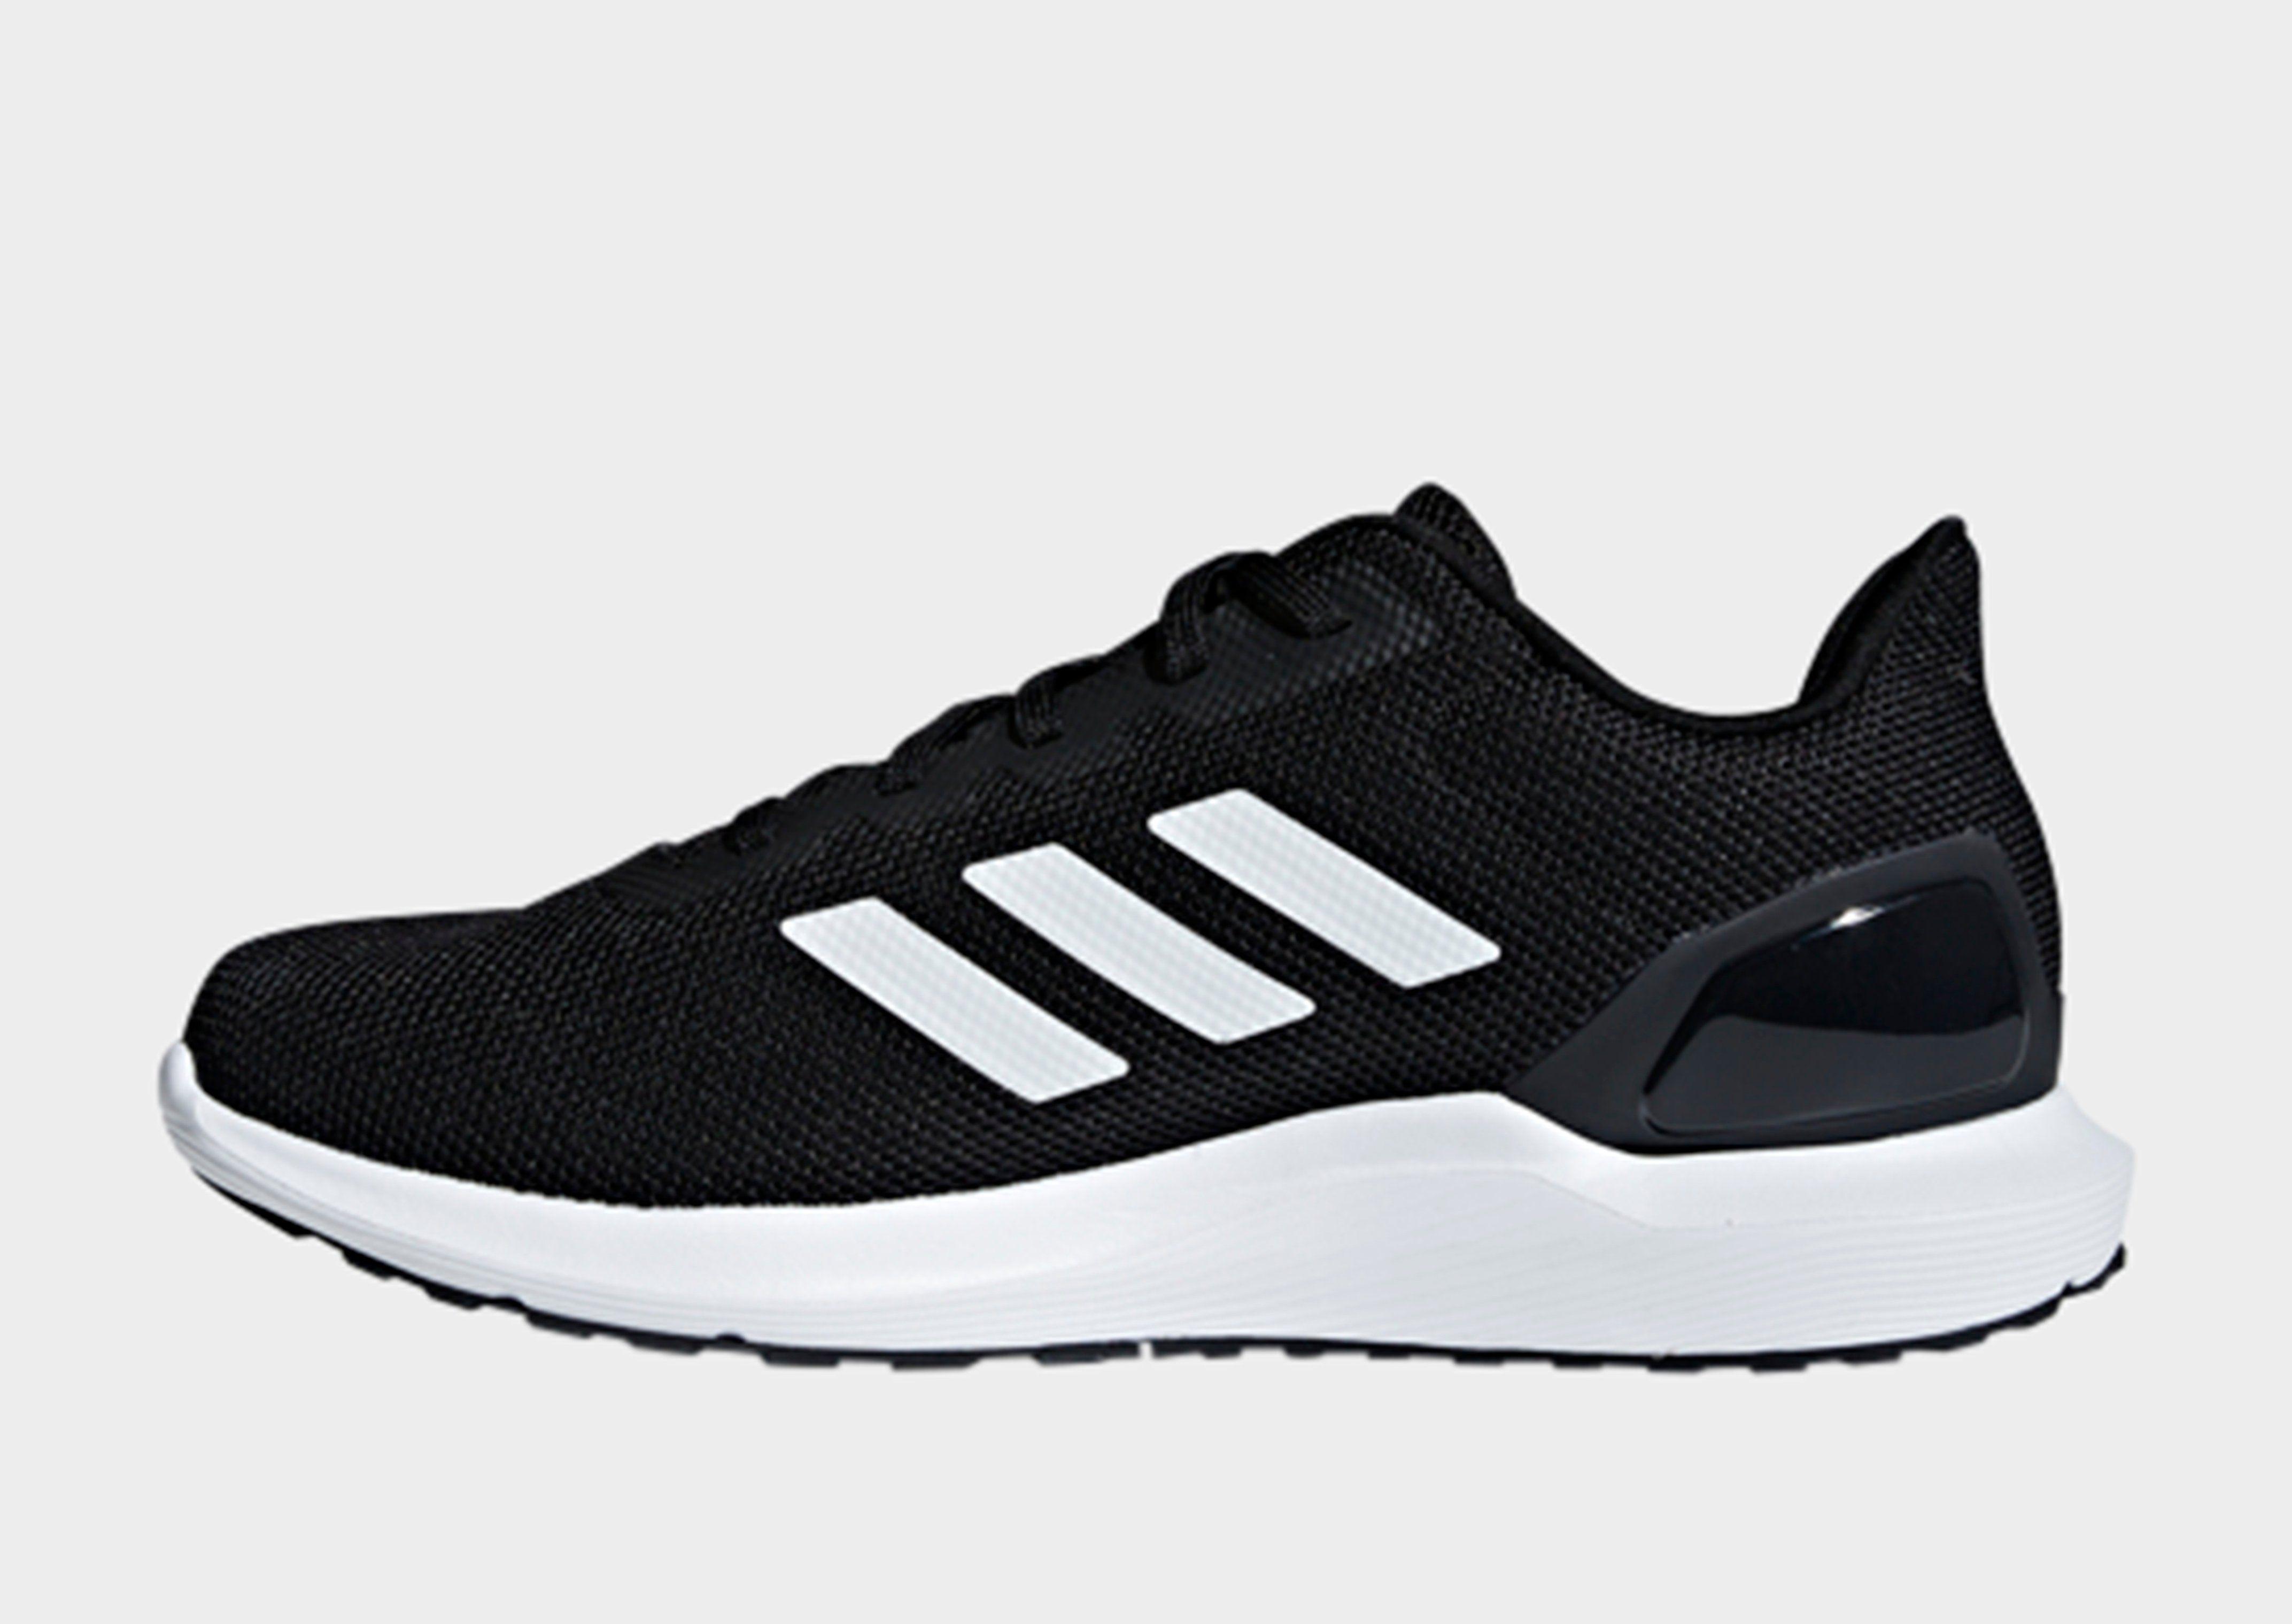 6837adf241e ADIDAS Cosmic 2 Shoes